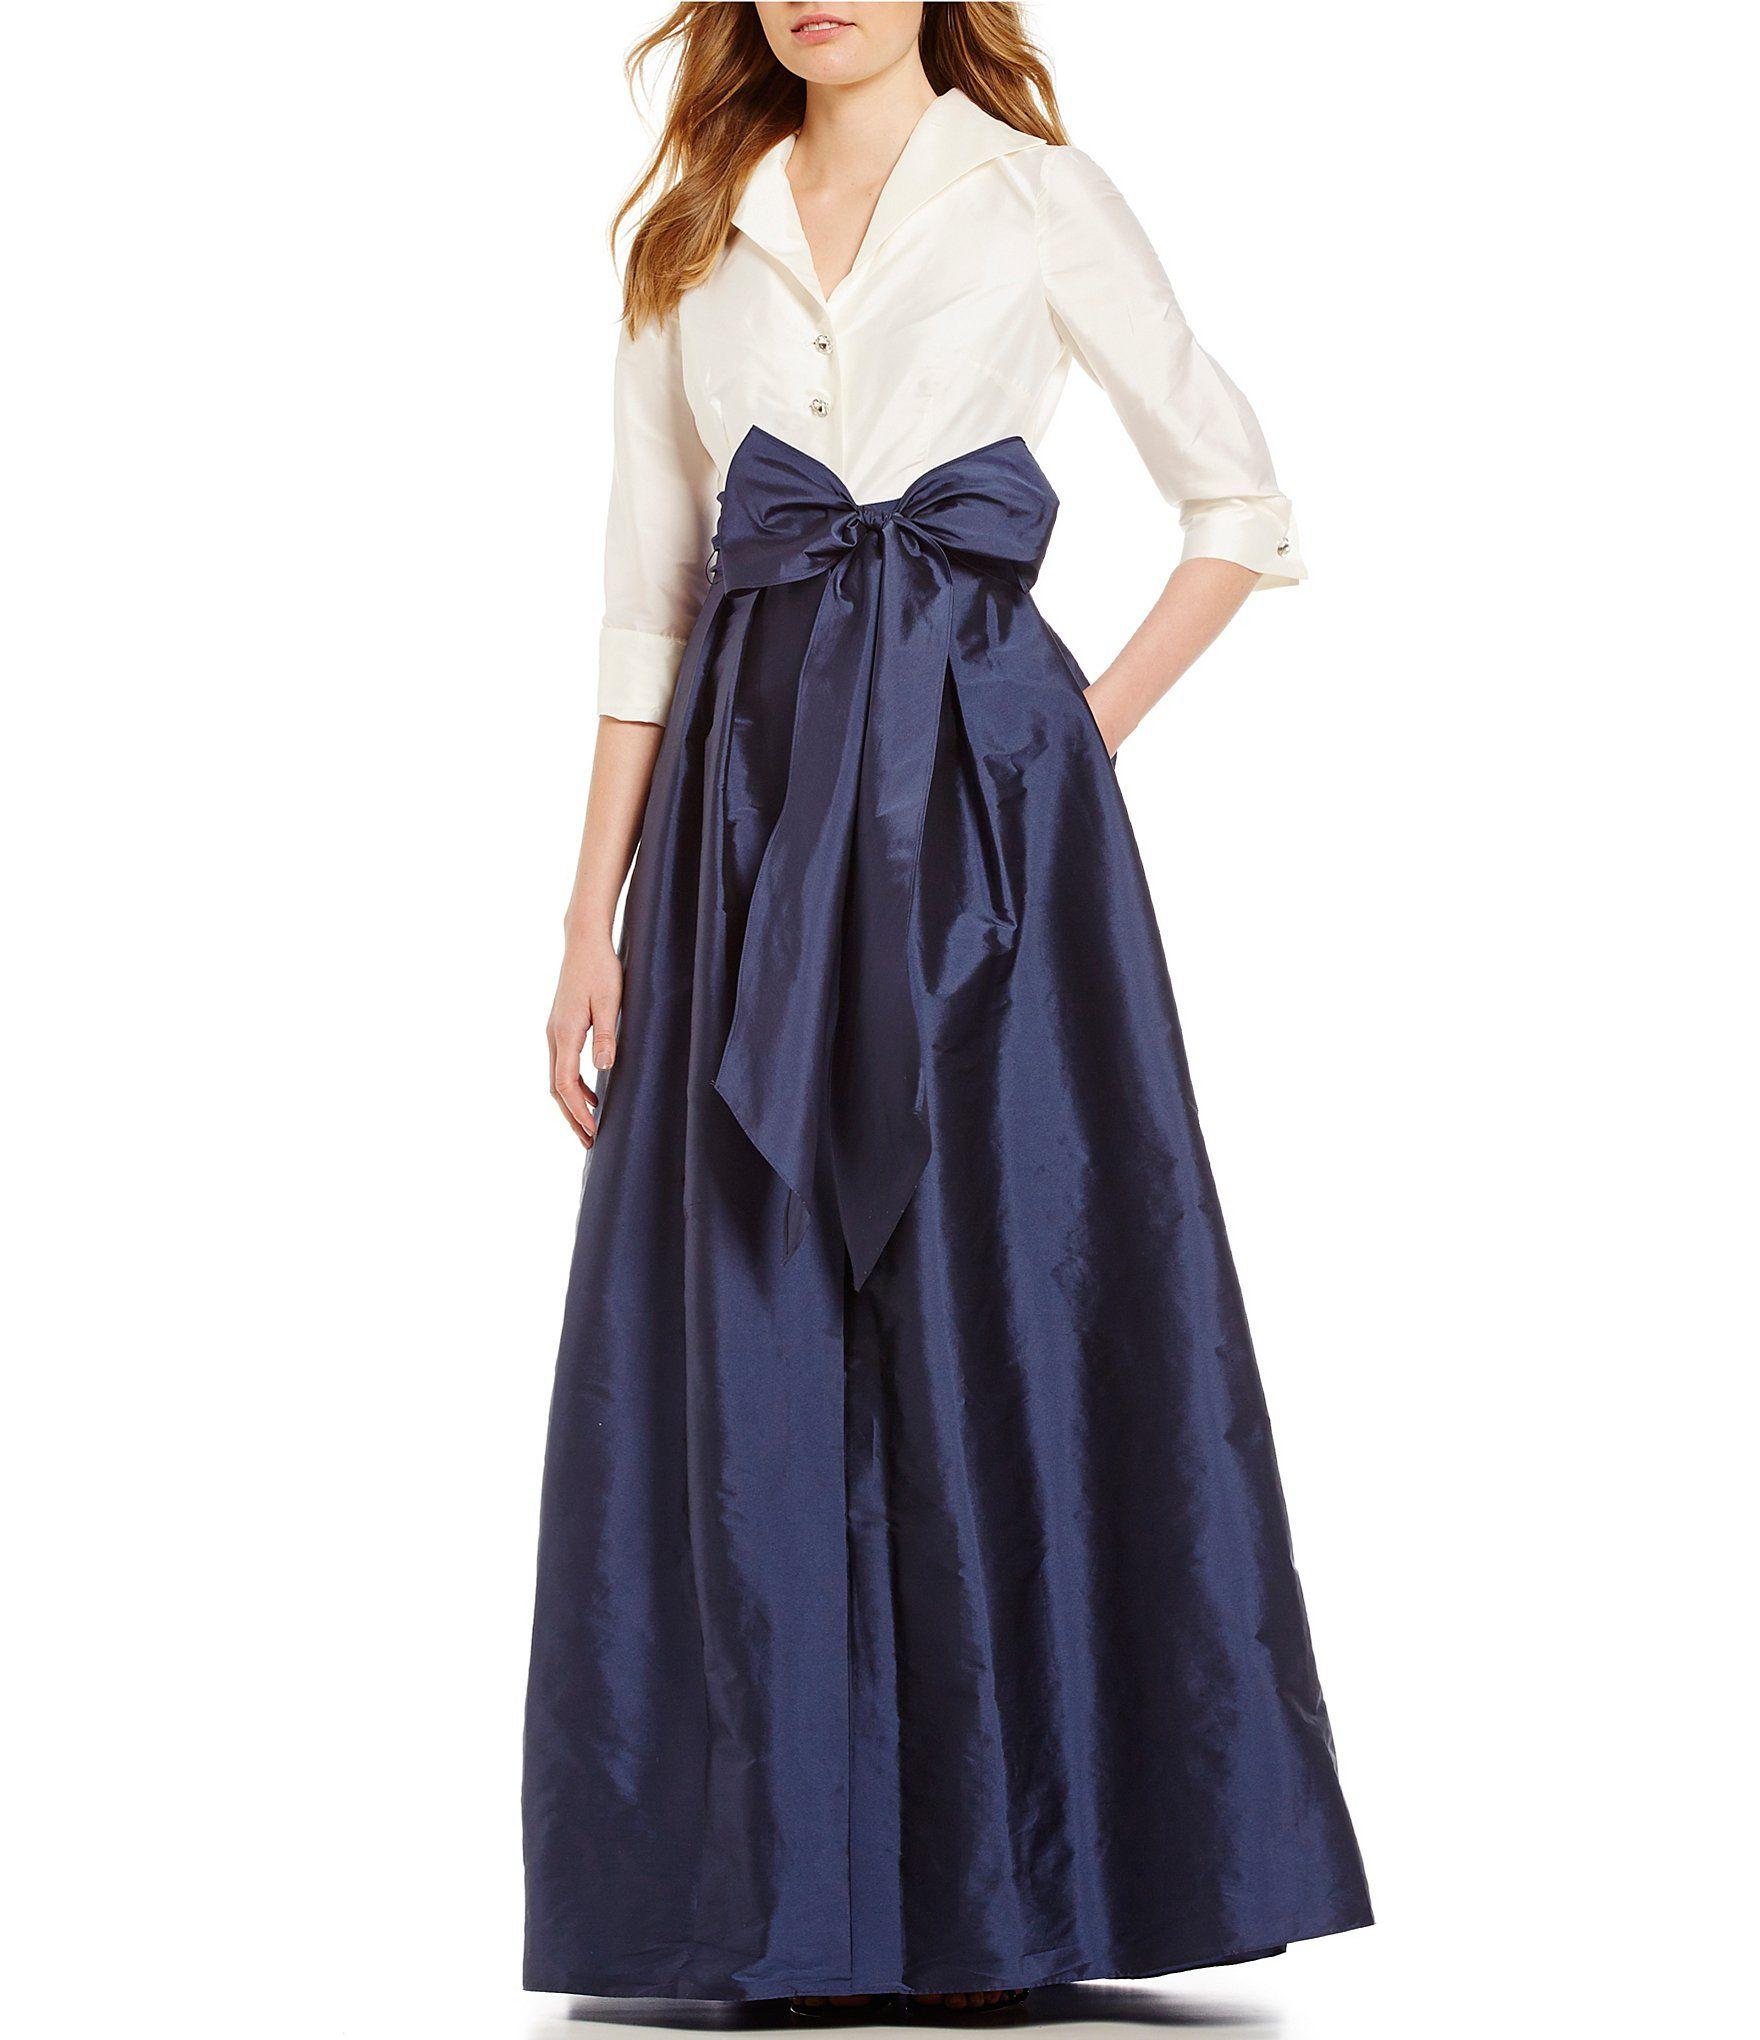 Adrianna Papell  Black Ivory Blouse Taffeta Ball Gown sz 4 Long Sleeve Modest